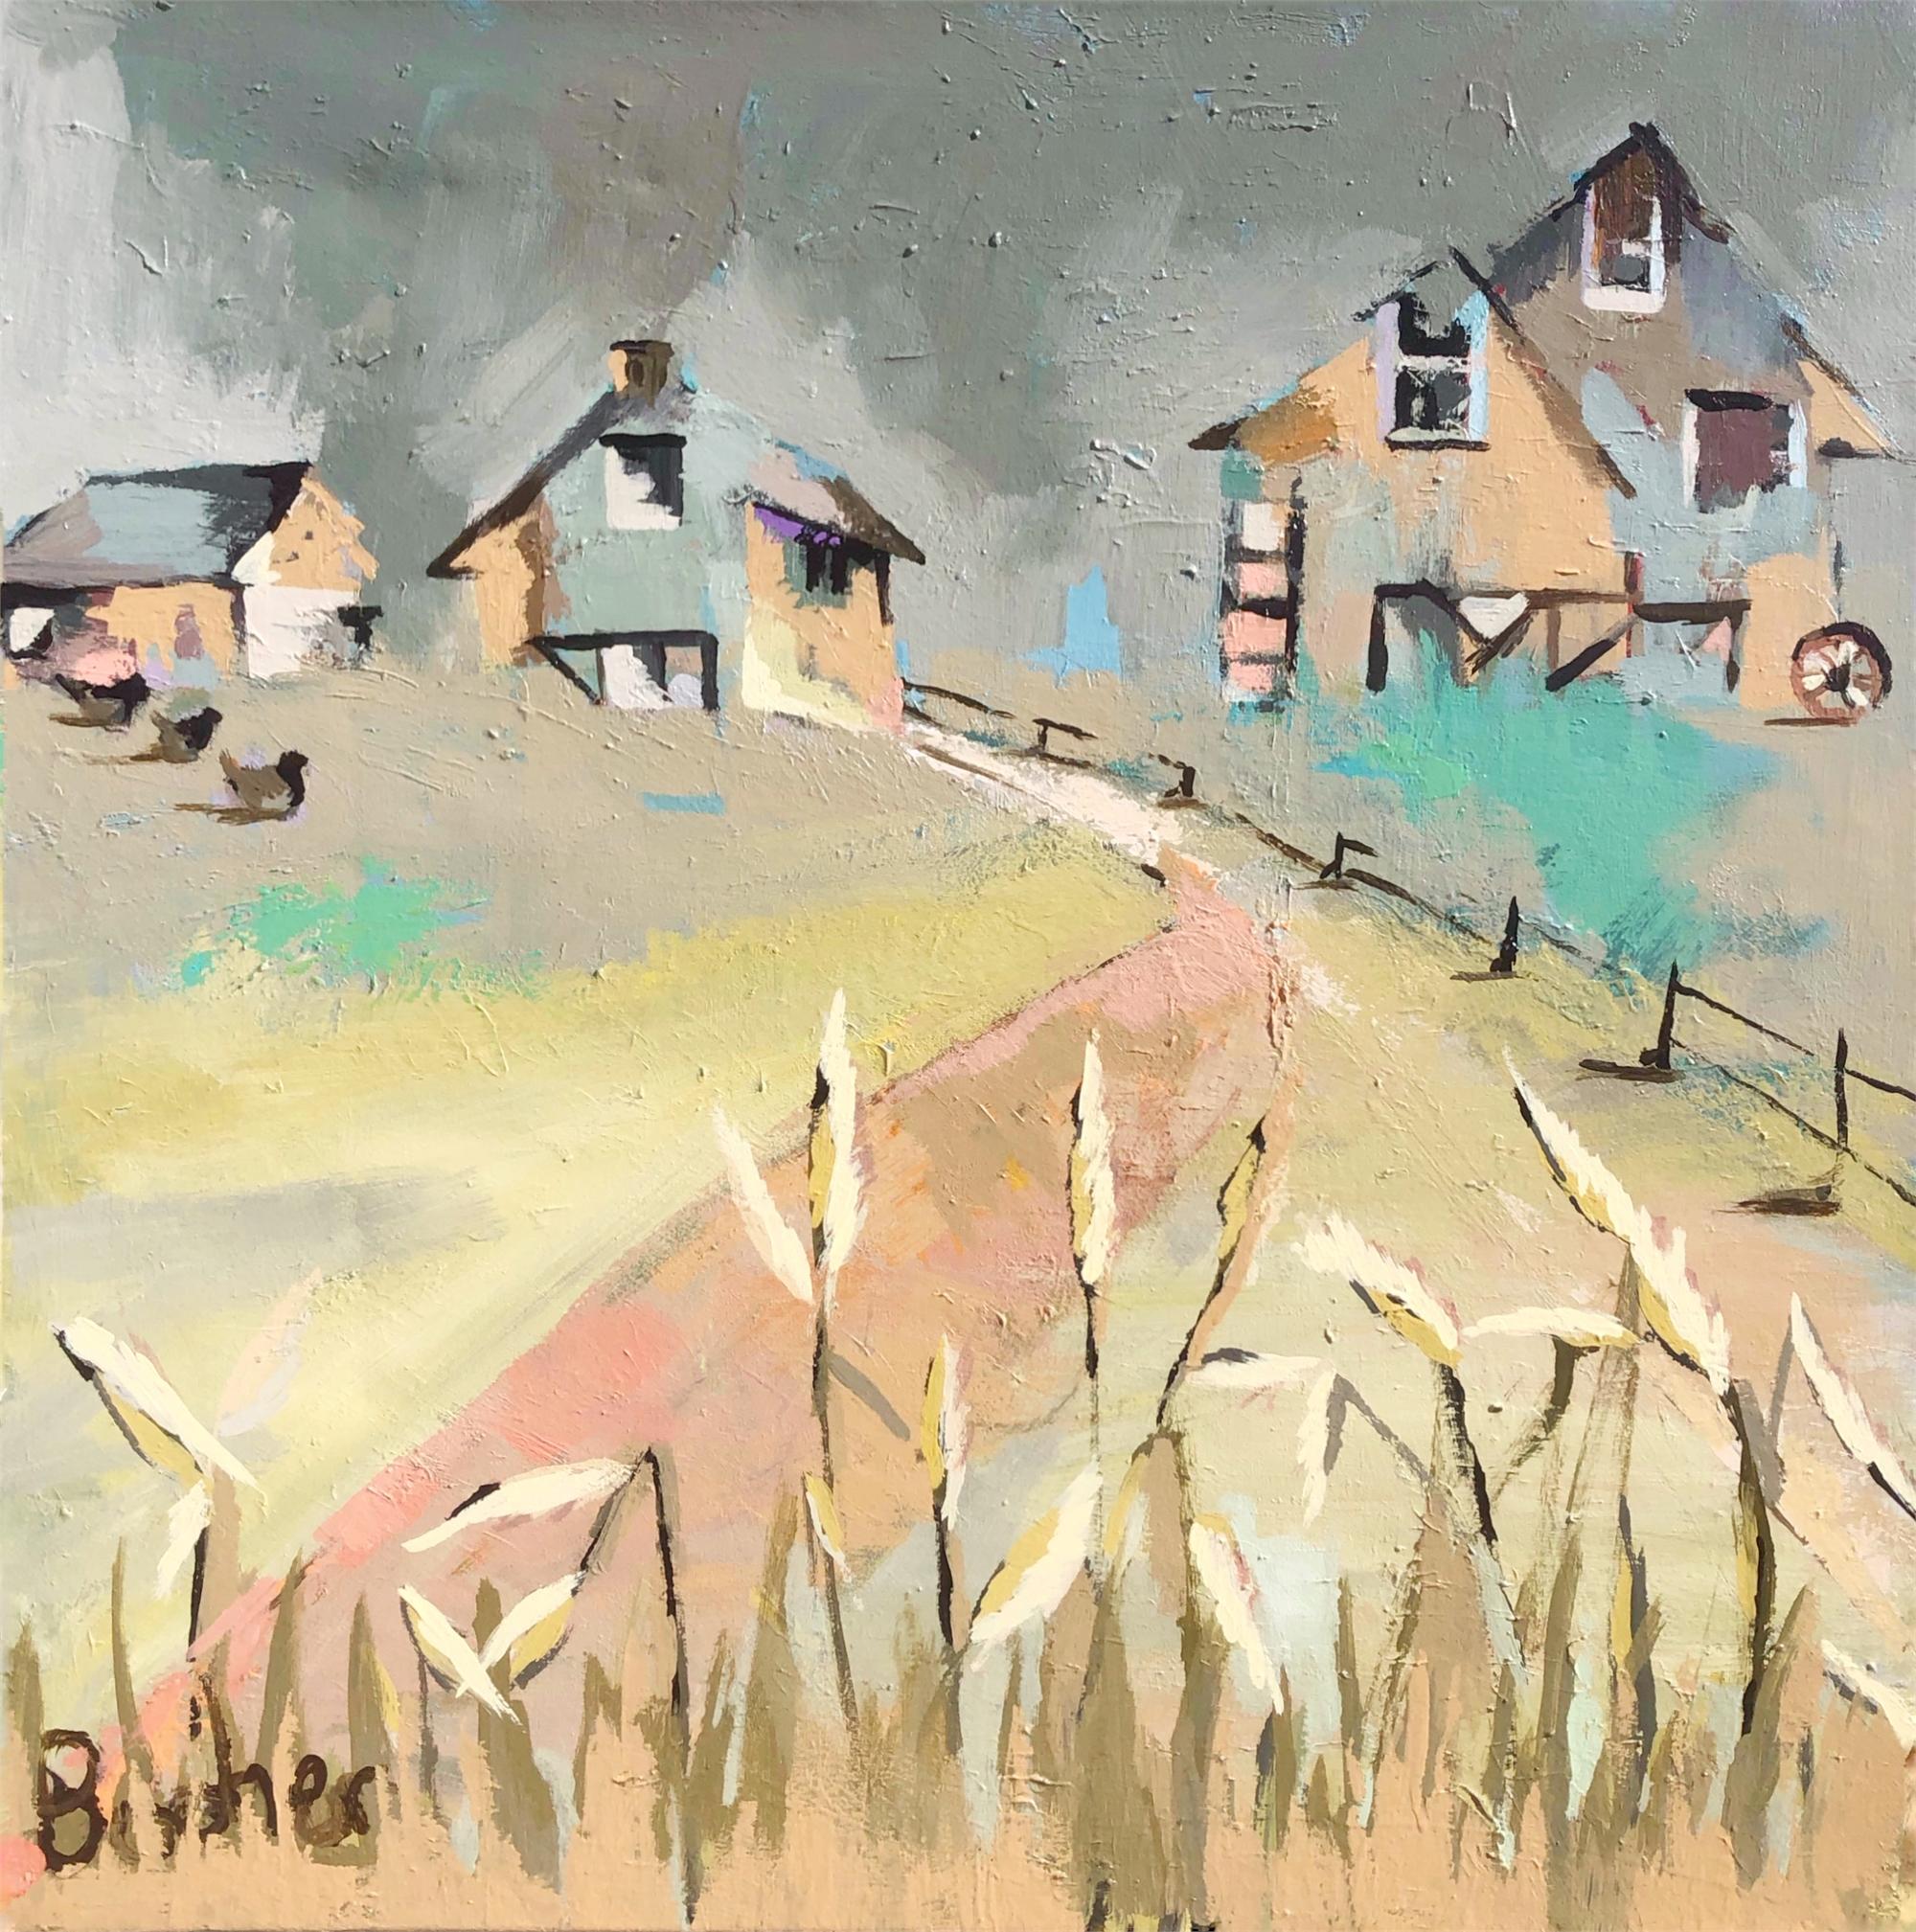 Hilltop Houses by Gary Bodner